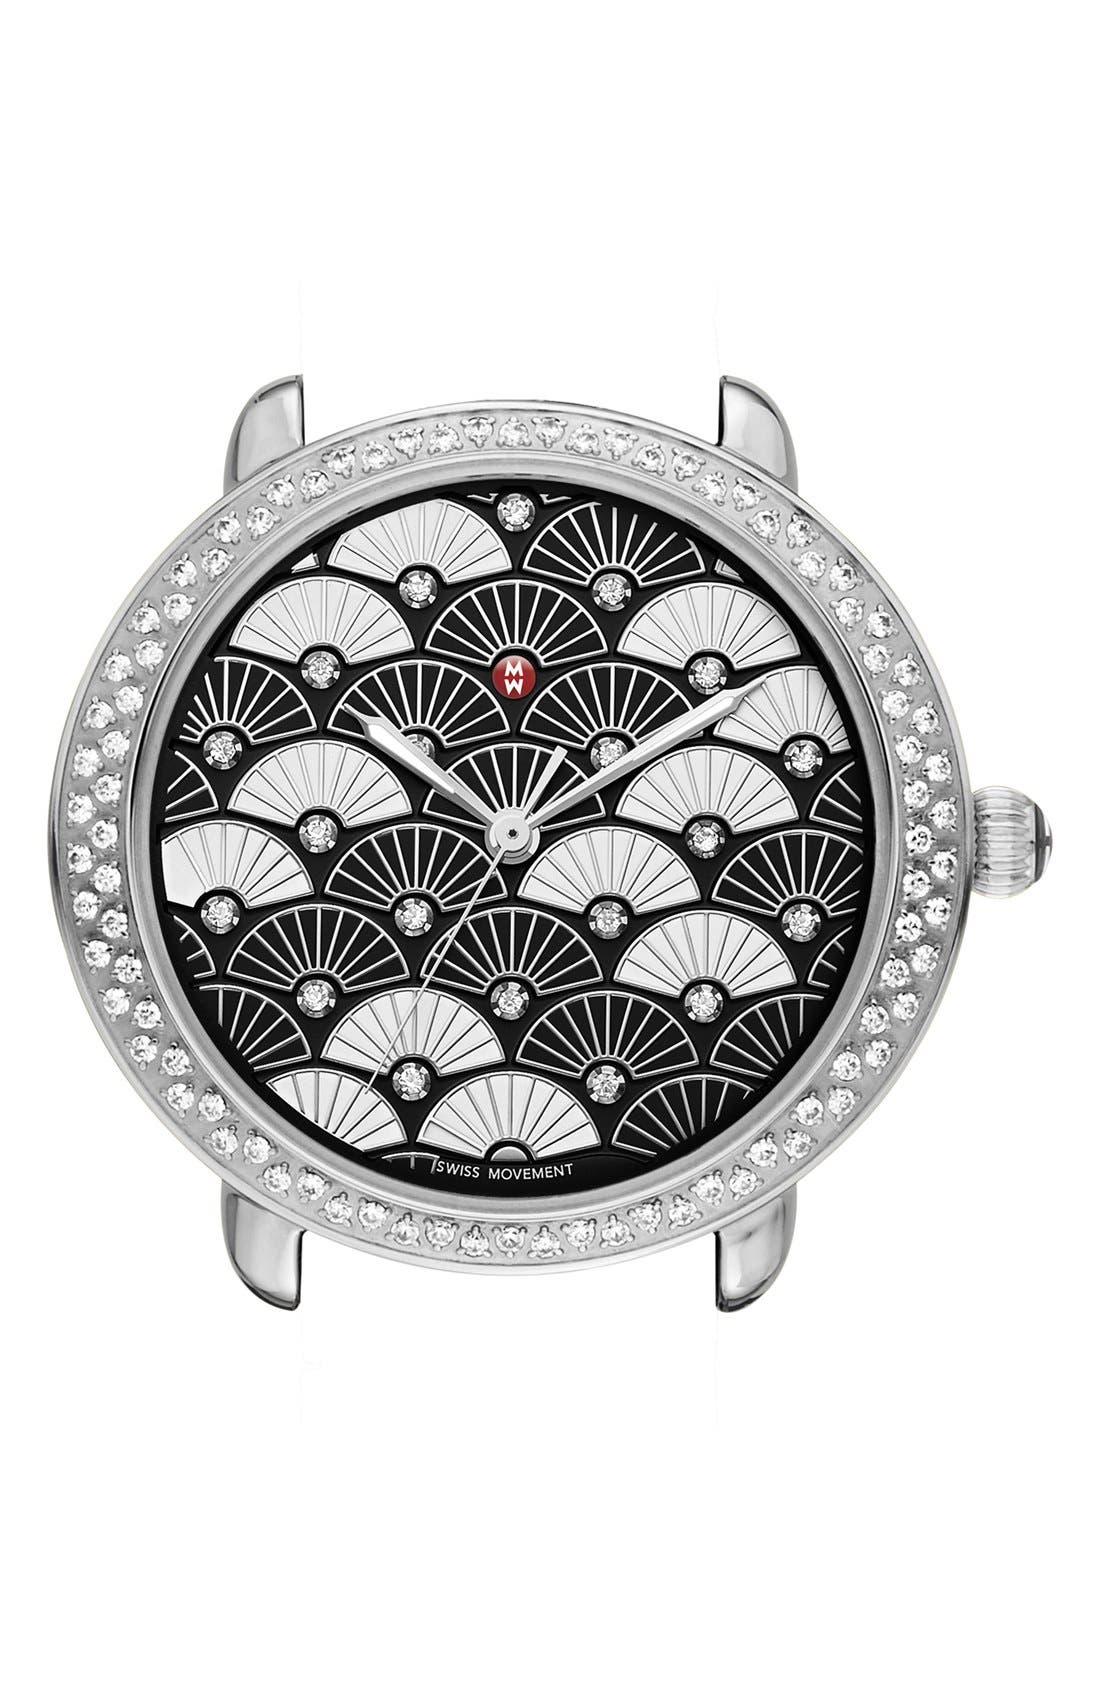 MICHELE Serein 16 Diamond Diamond Fan Mosaic Watch Case, 34mm x 36mm